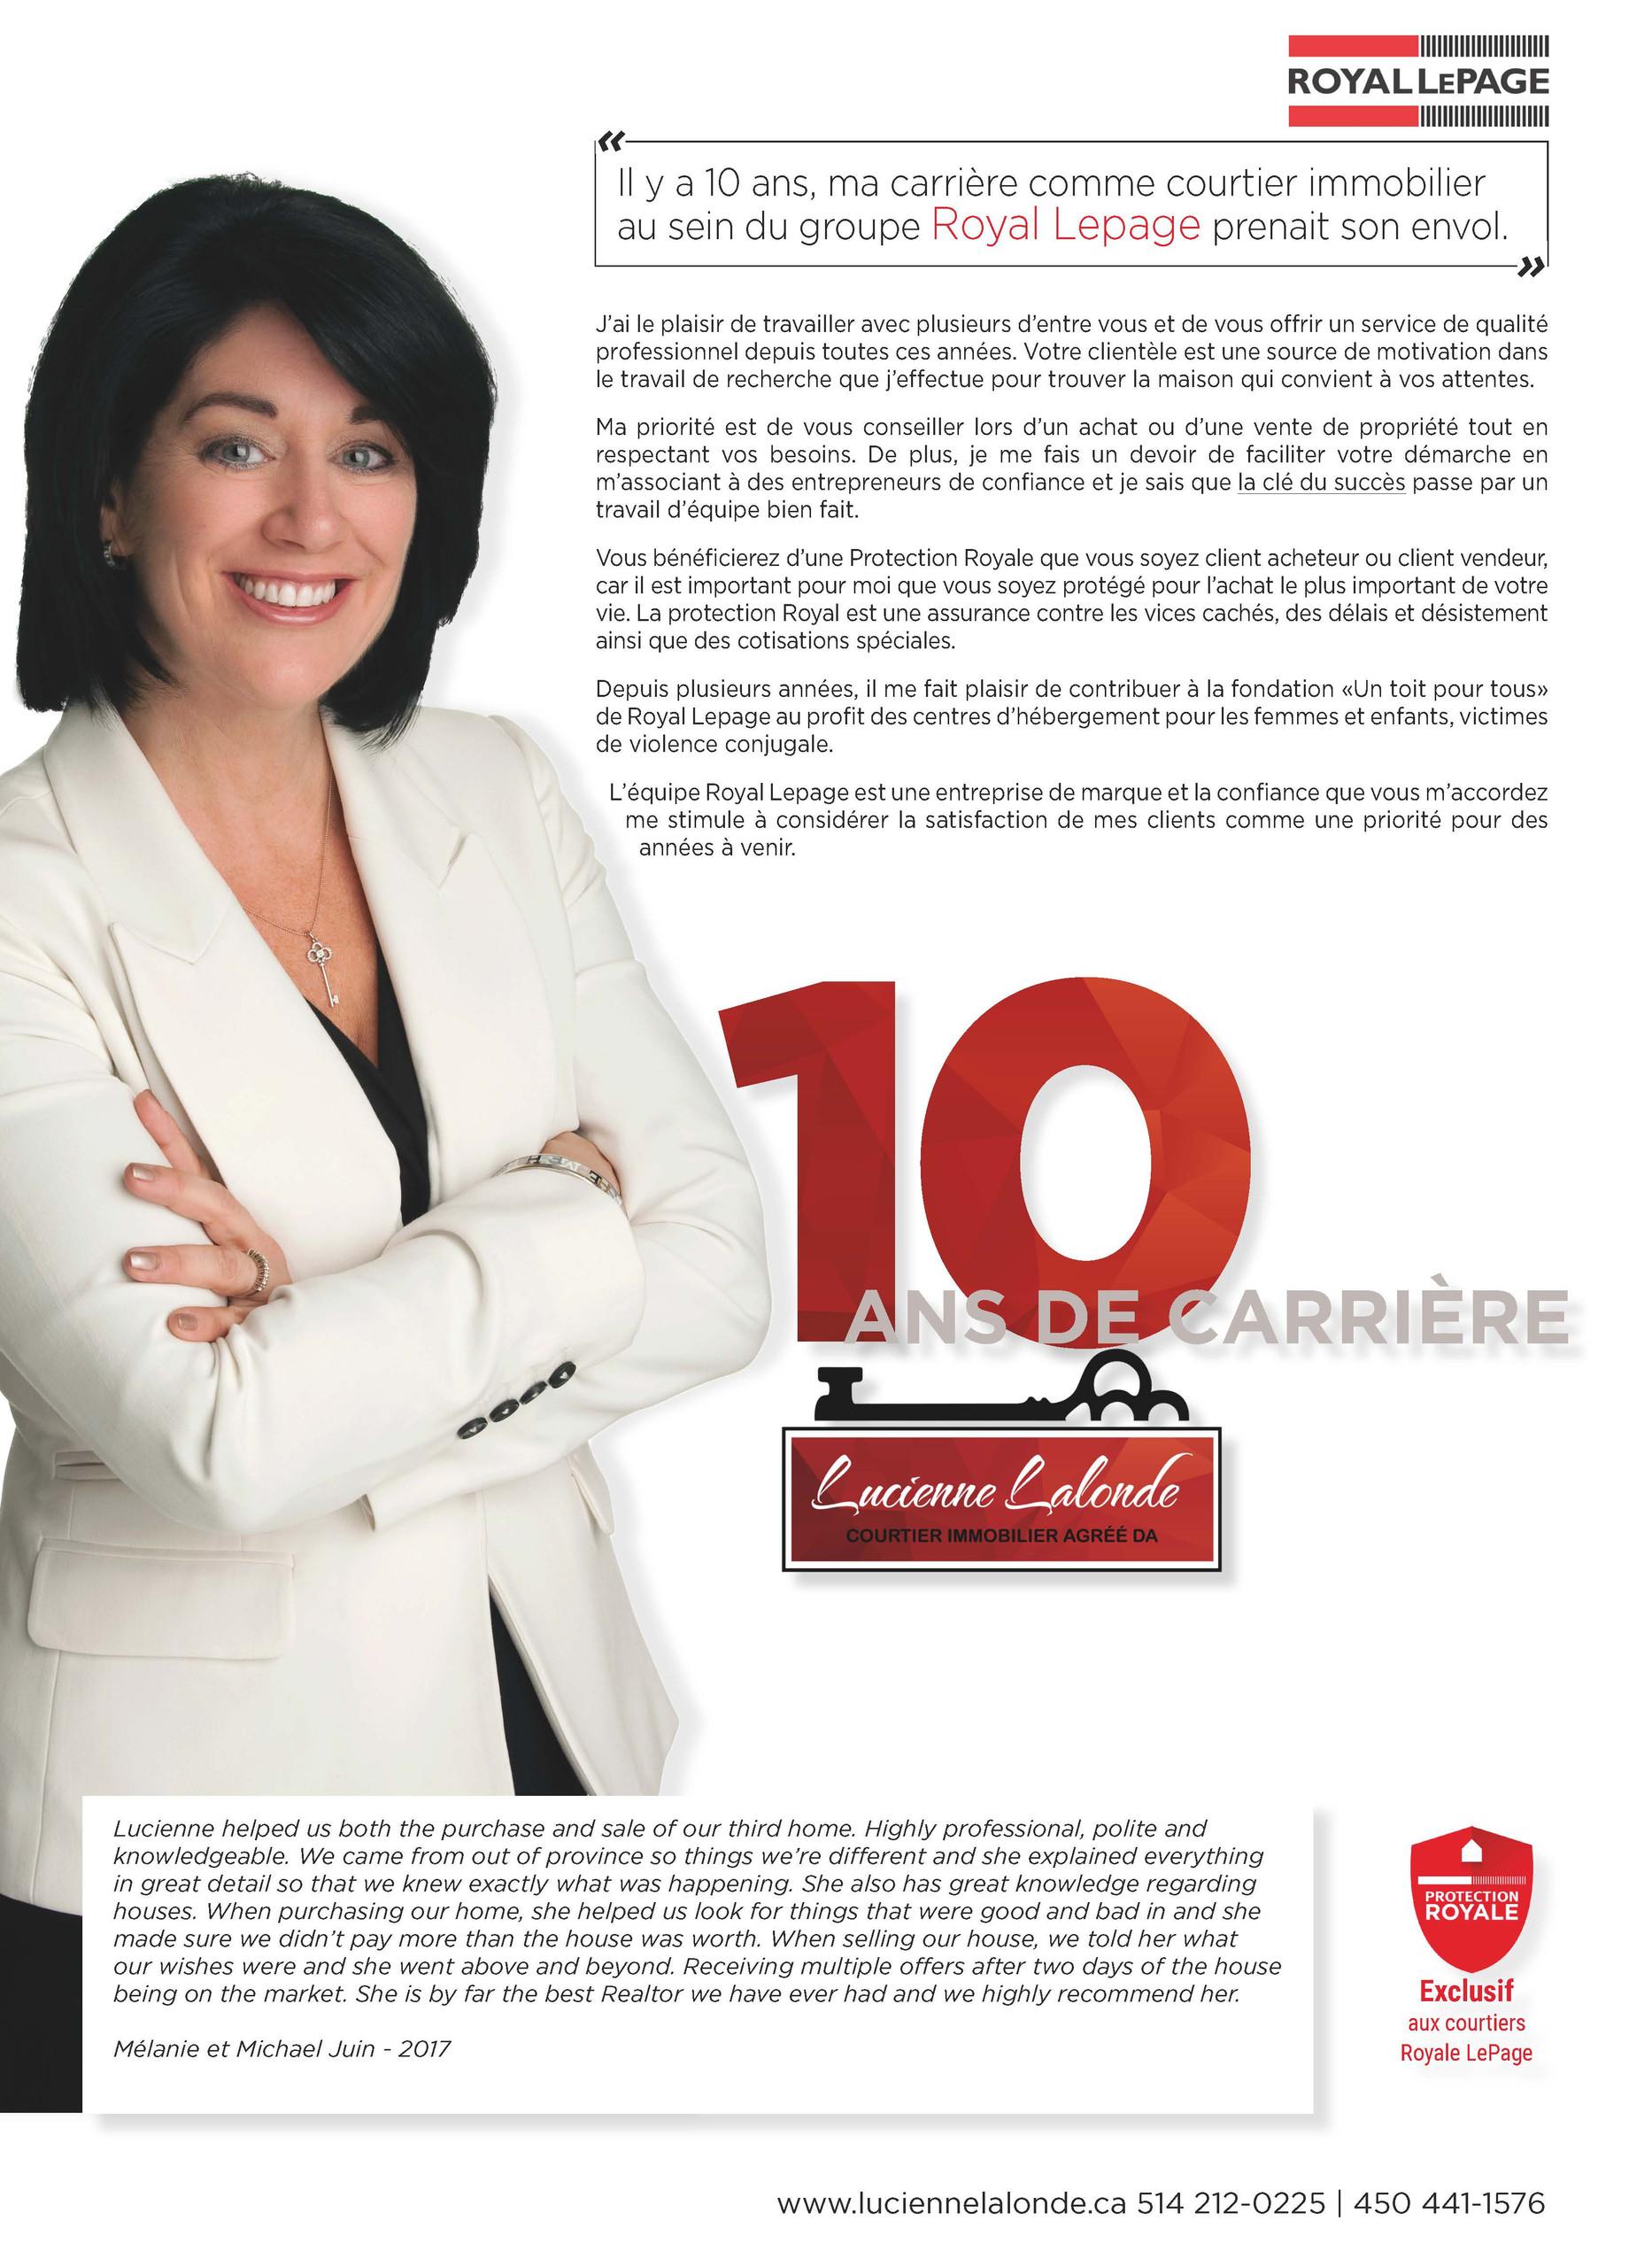 lucienne_lalonde_10ans_carrières.jpg